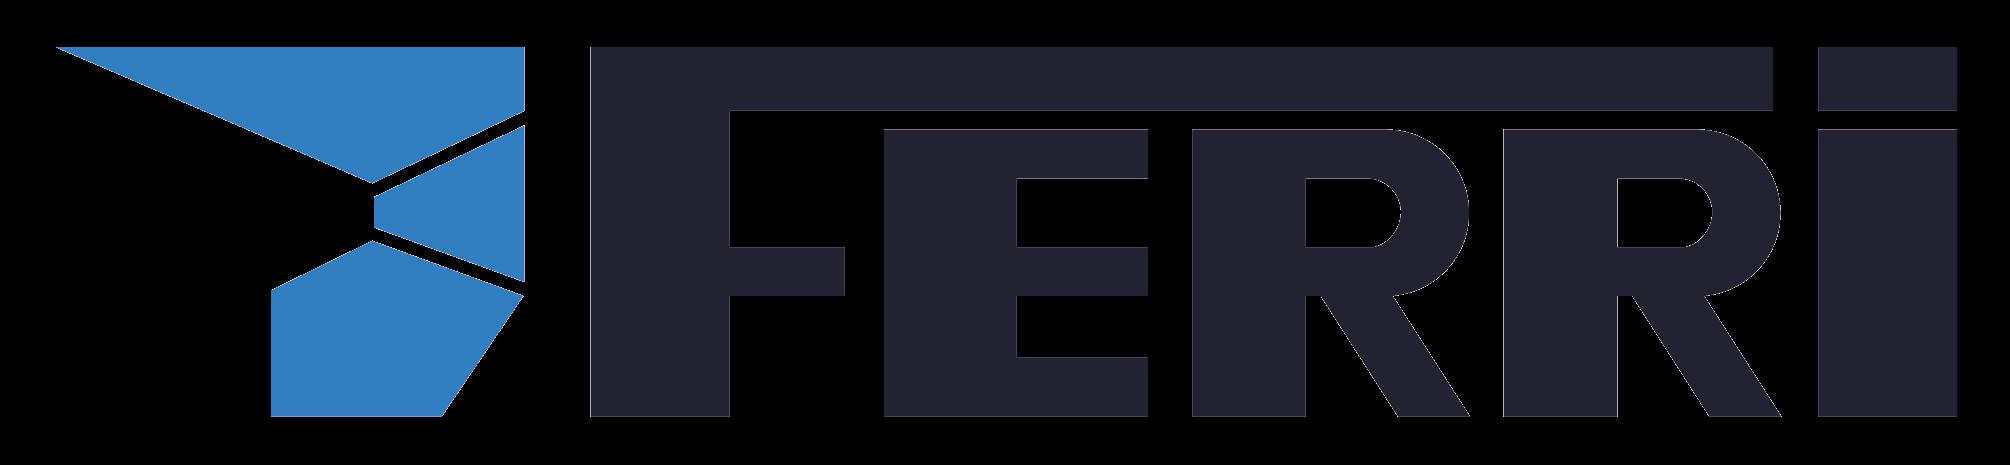 Industrias Ferri S.A